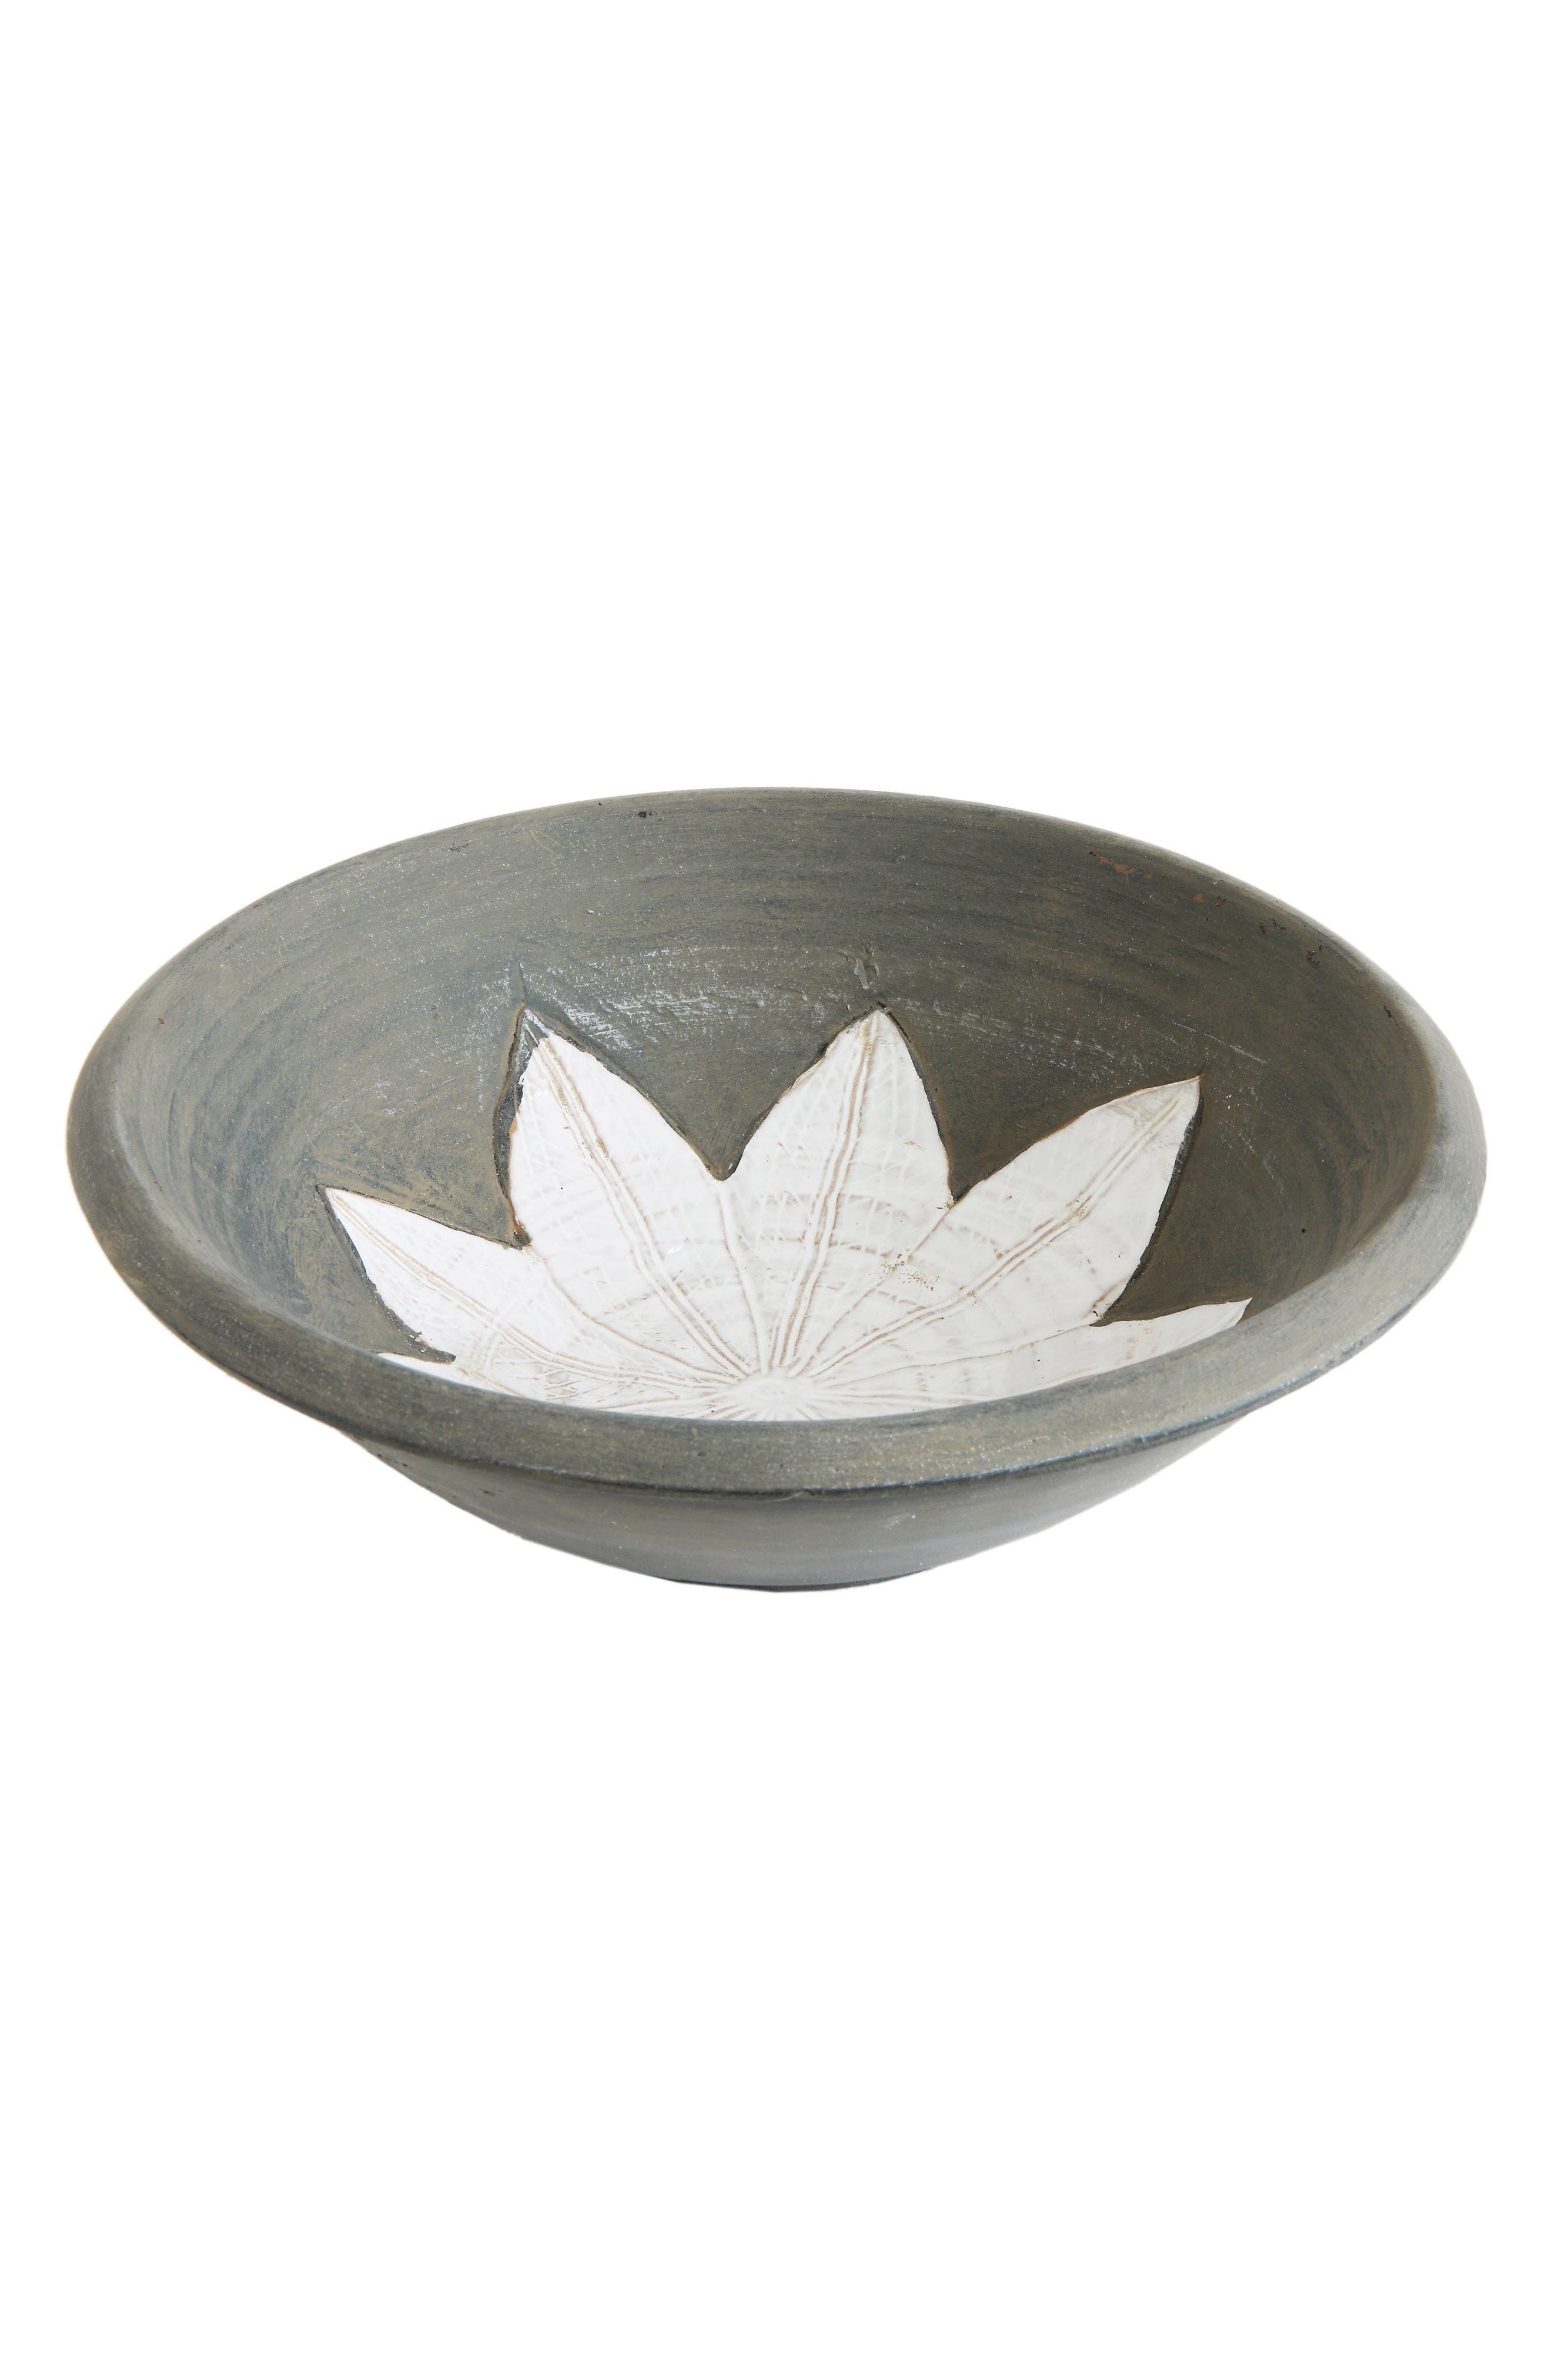 Main Image - Creative Co-Op Terra Cotta Bowl